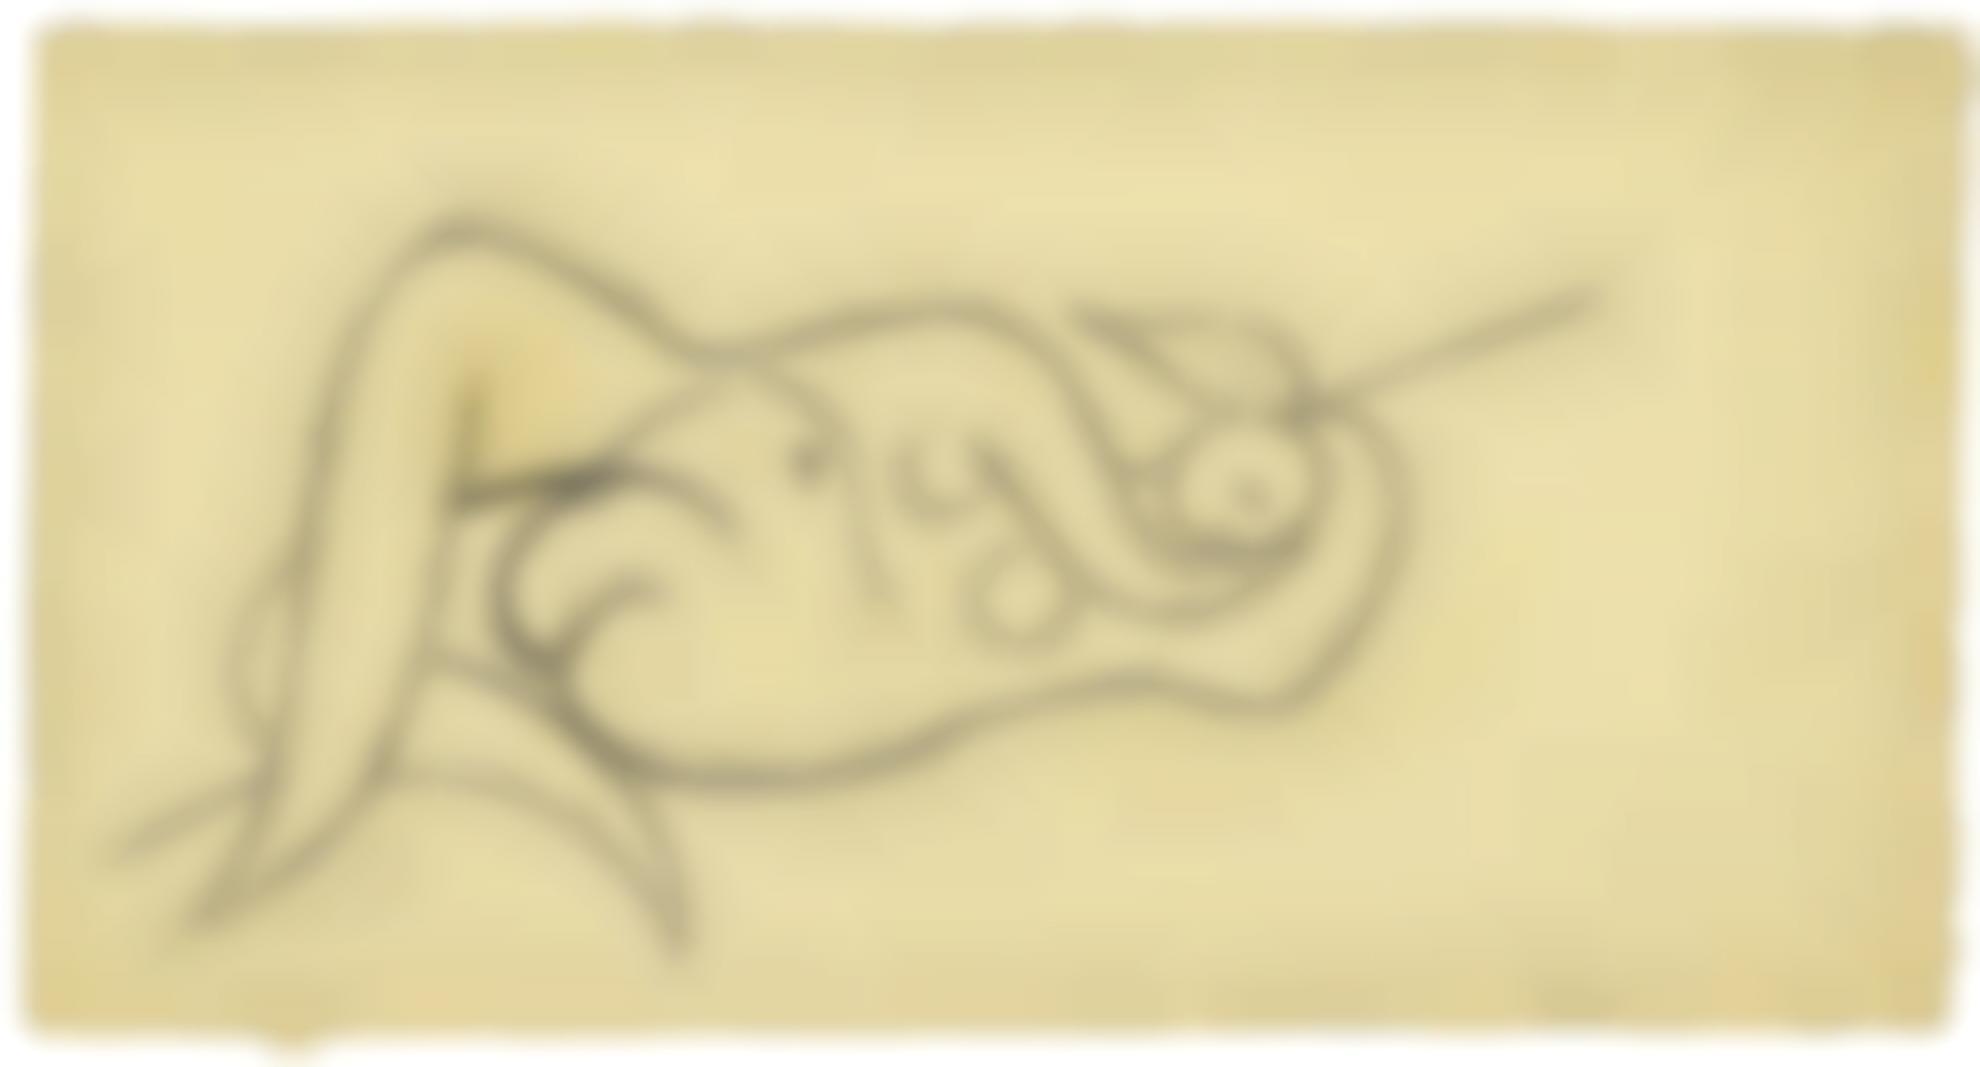 Pablo Picasso-Femme Nue Couchee-1932